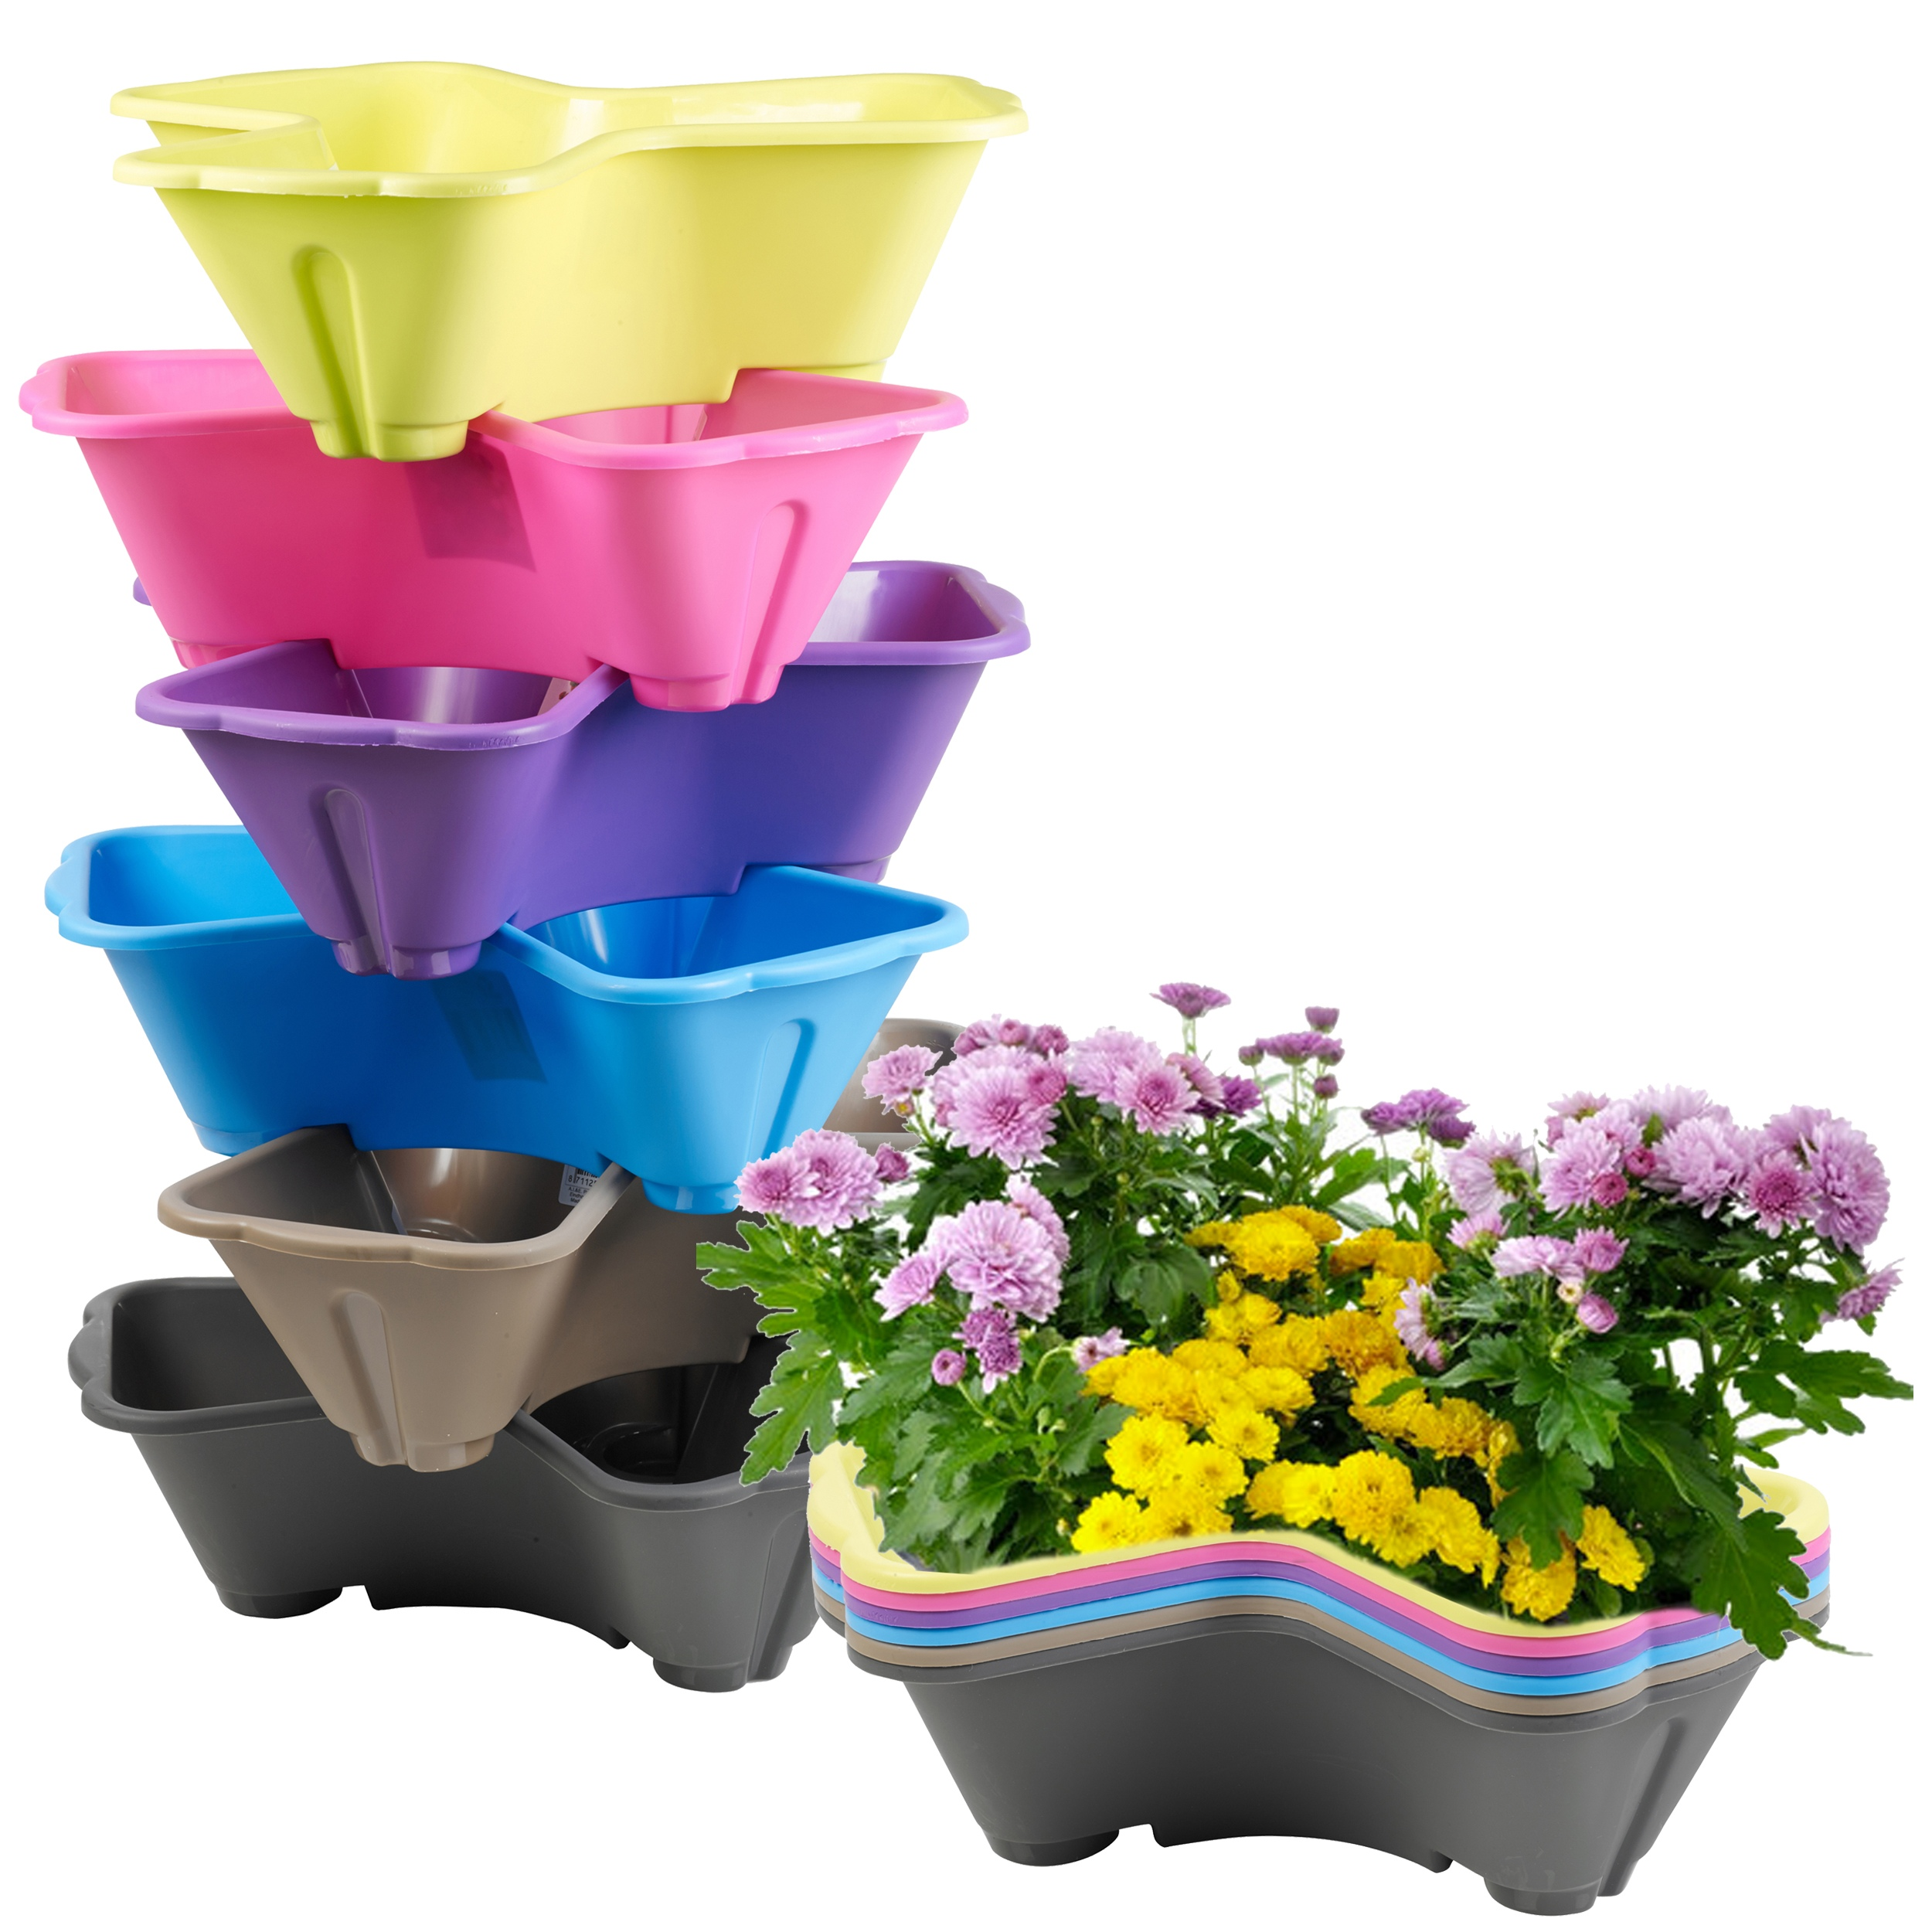 Stackable Plastic 3 Plants Flower Pots Pot Holder Coloured Herb Planter Garde